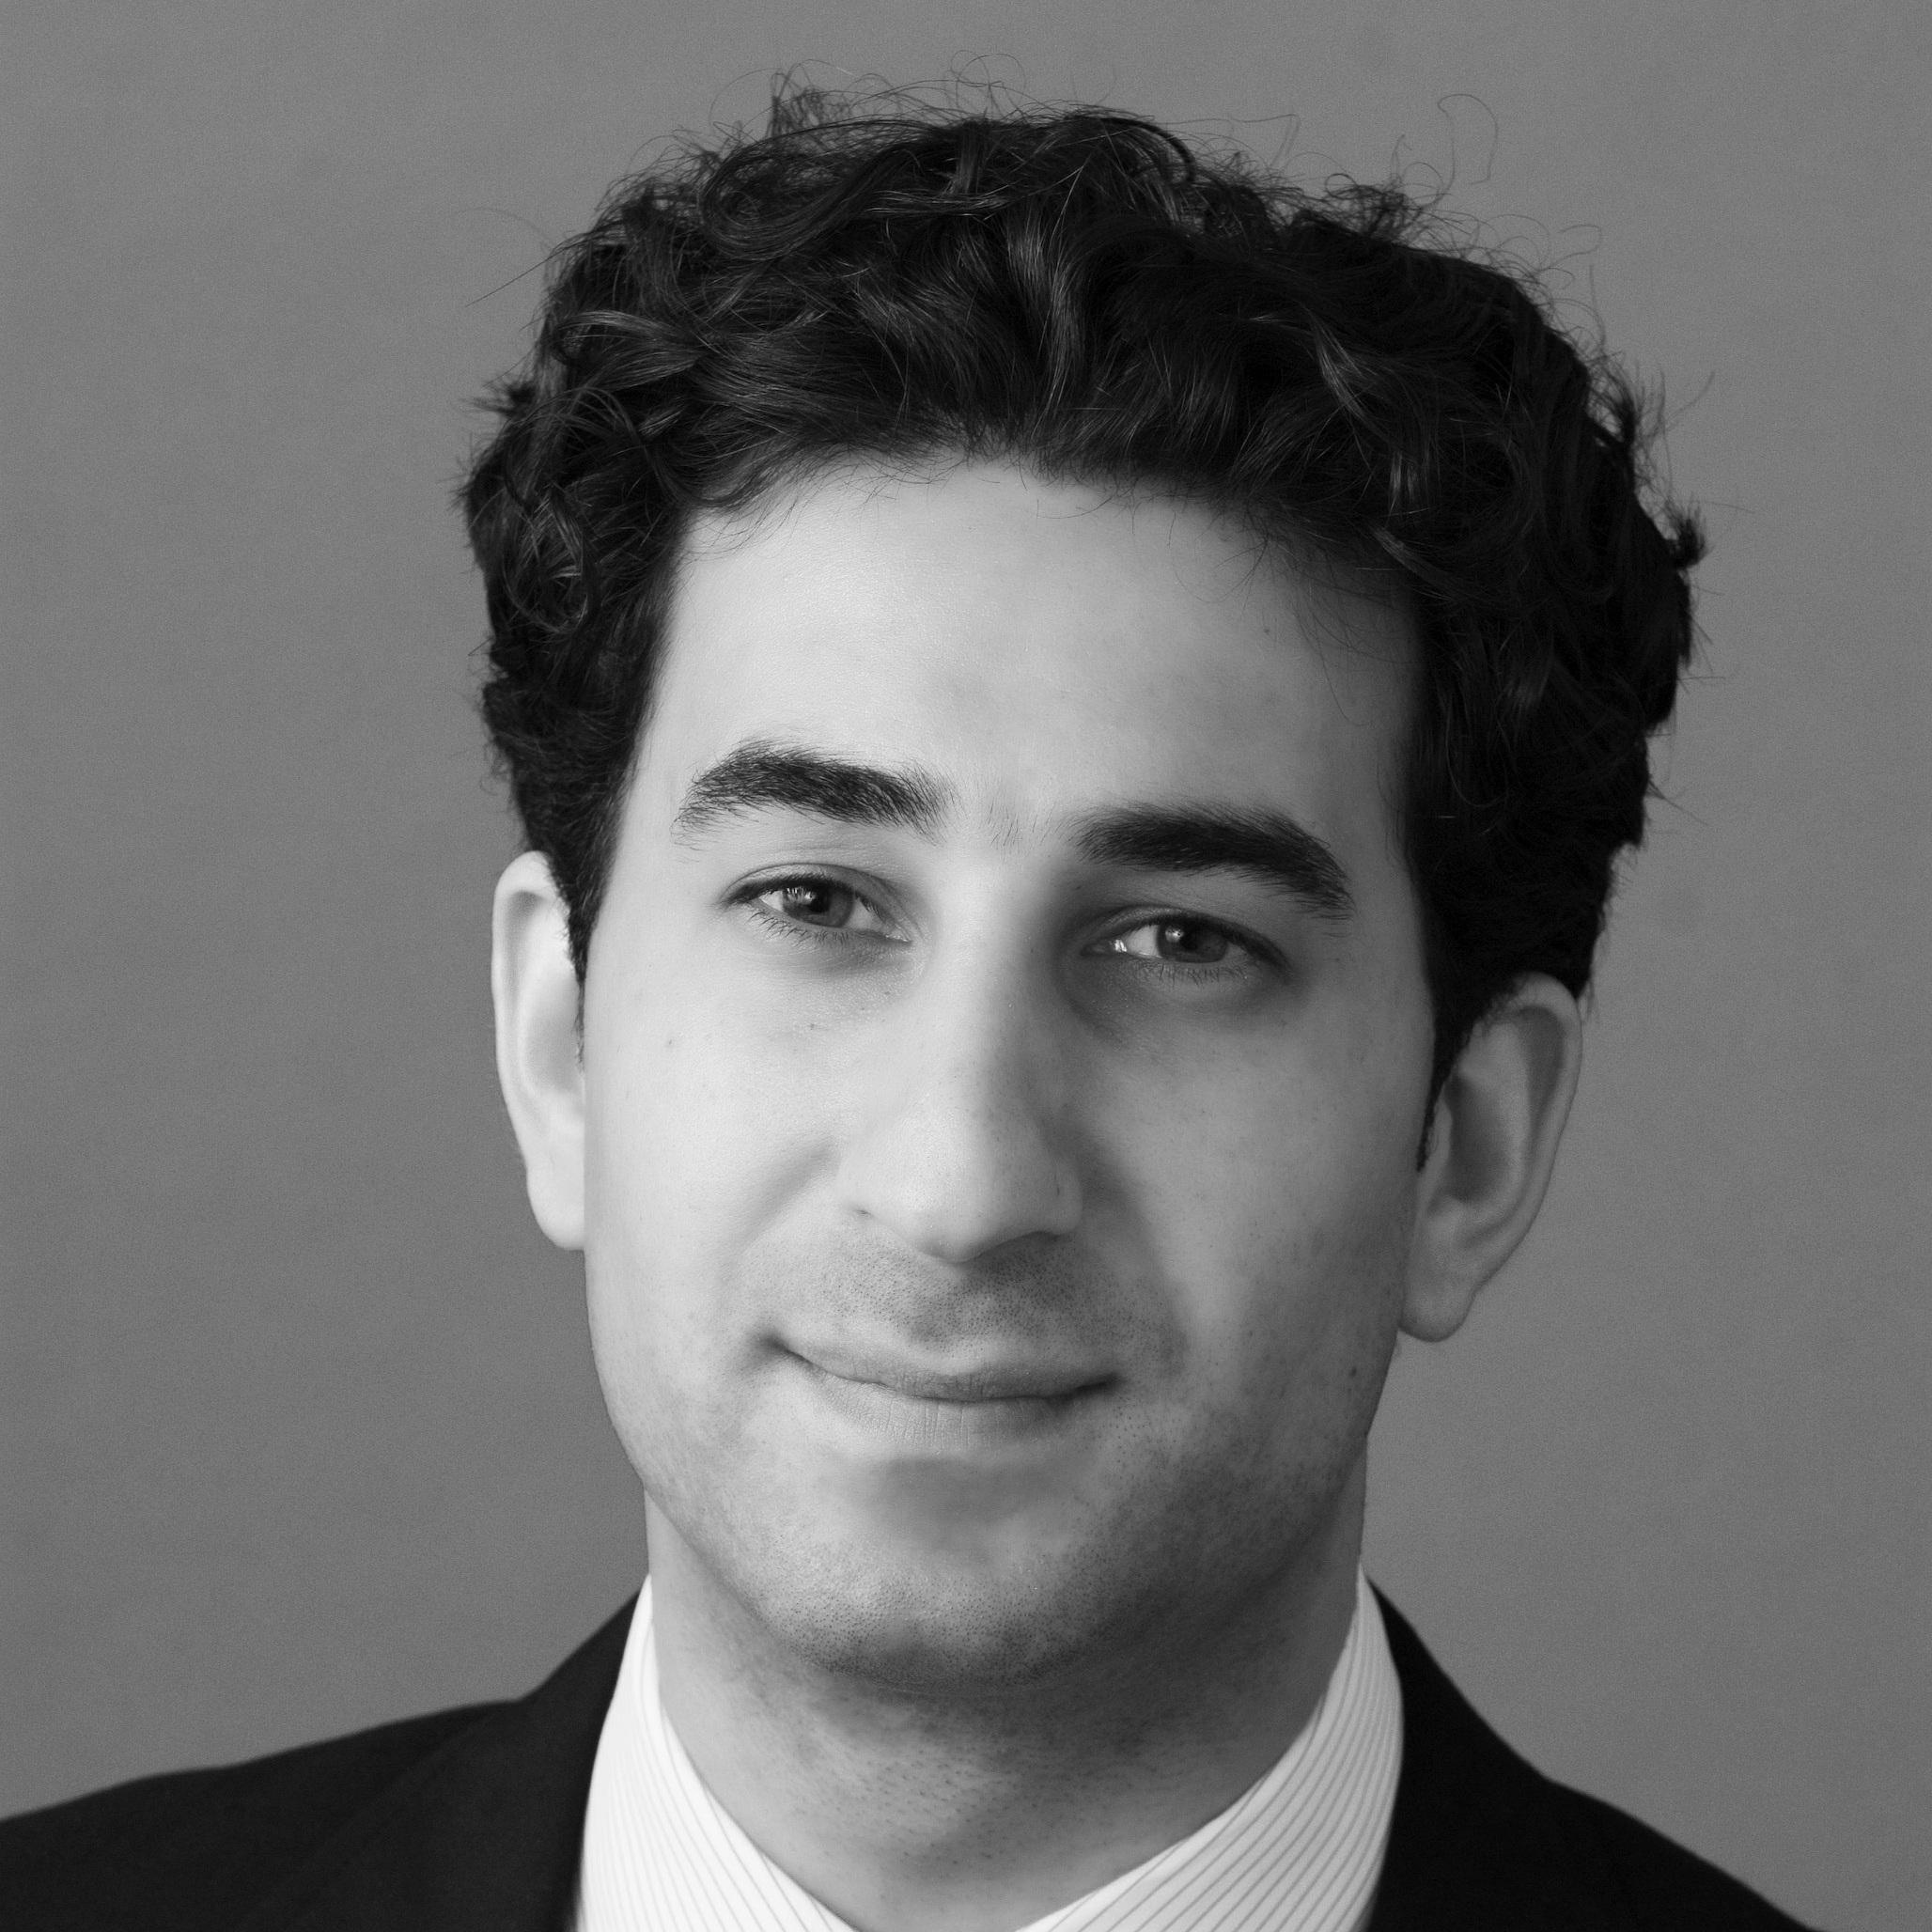 Karim Sadjadpour - Policy analyst